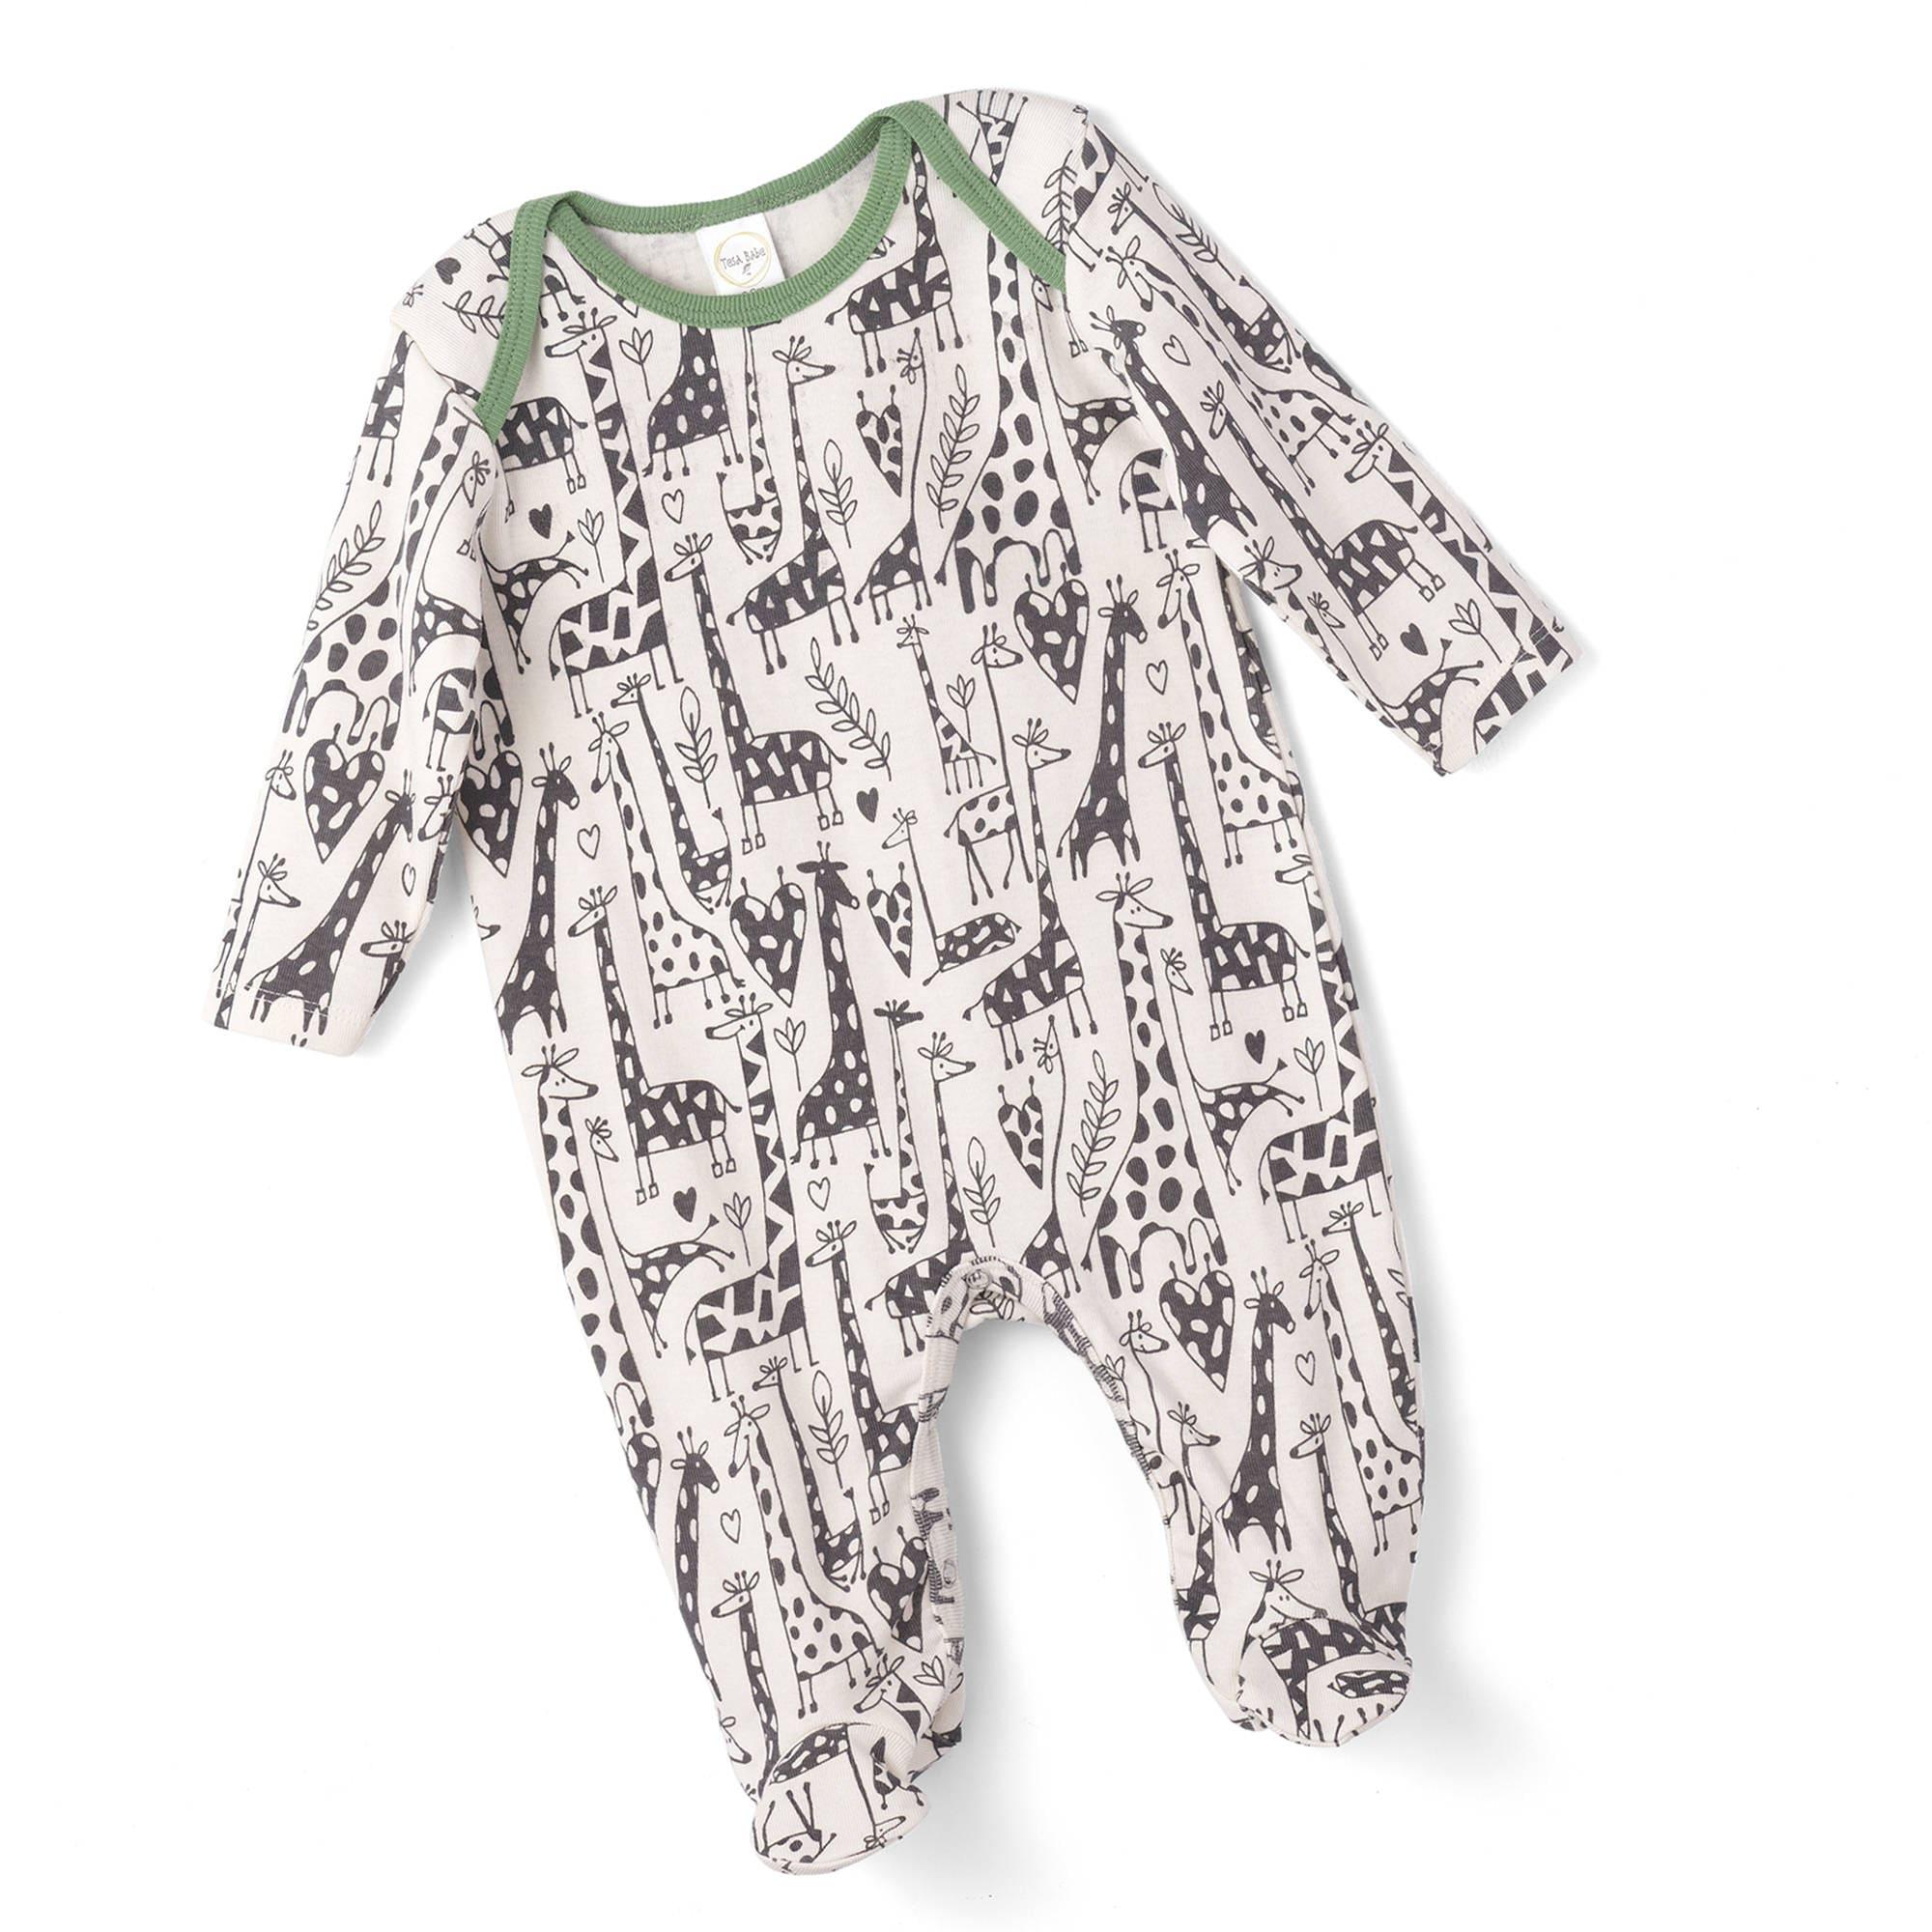 Newborn Baby Boy ing Home Outfit Infant Boy Romper Baby Boy